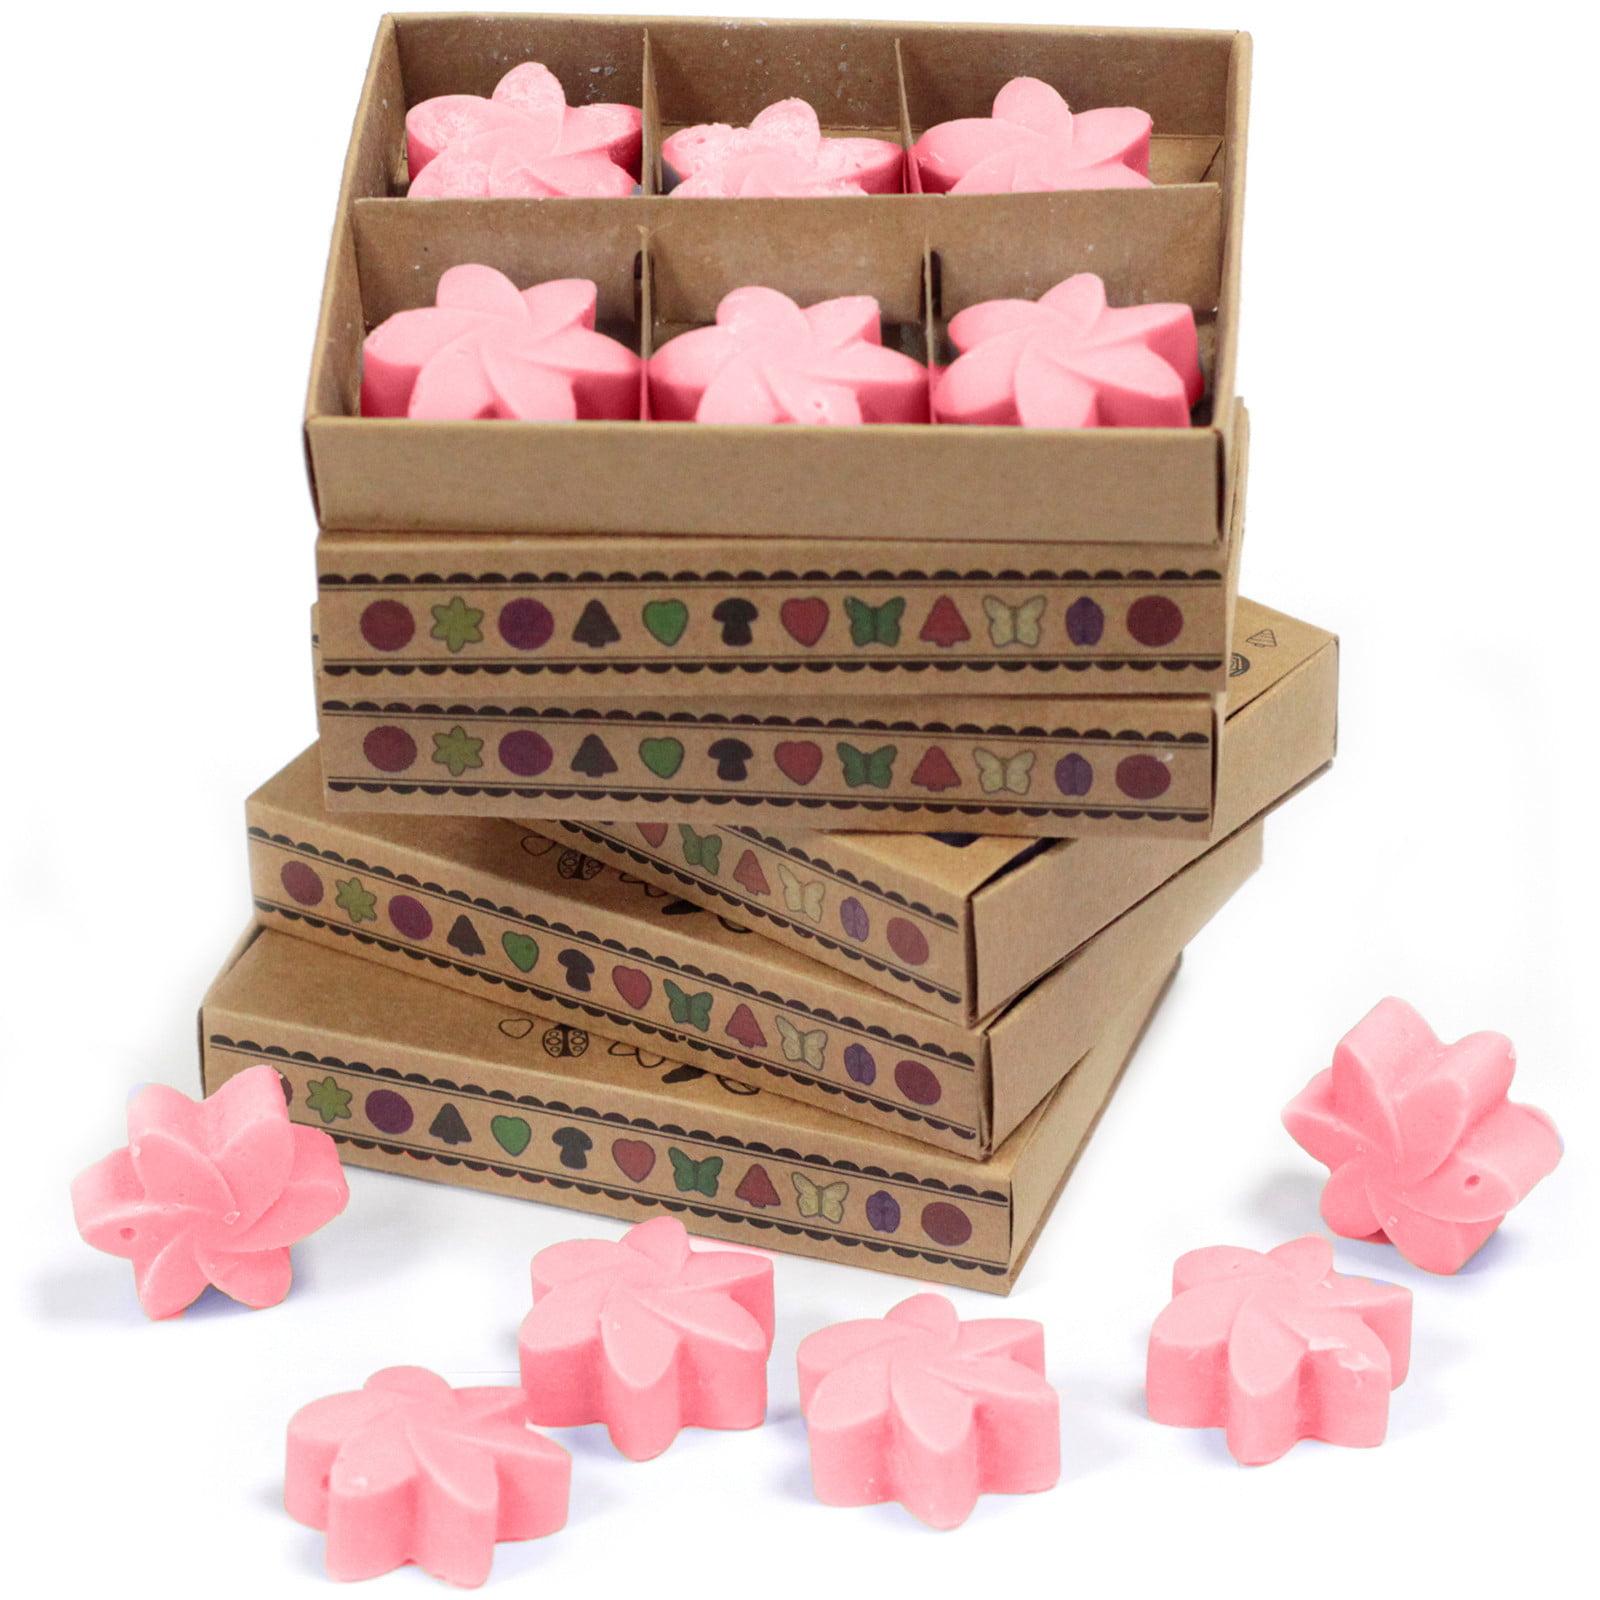 Caixa de 6 velas de soja – Magnólia Japonesa